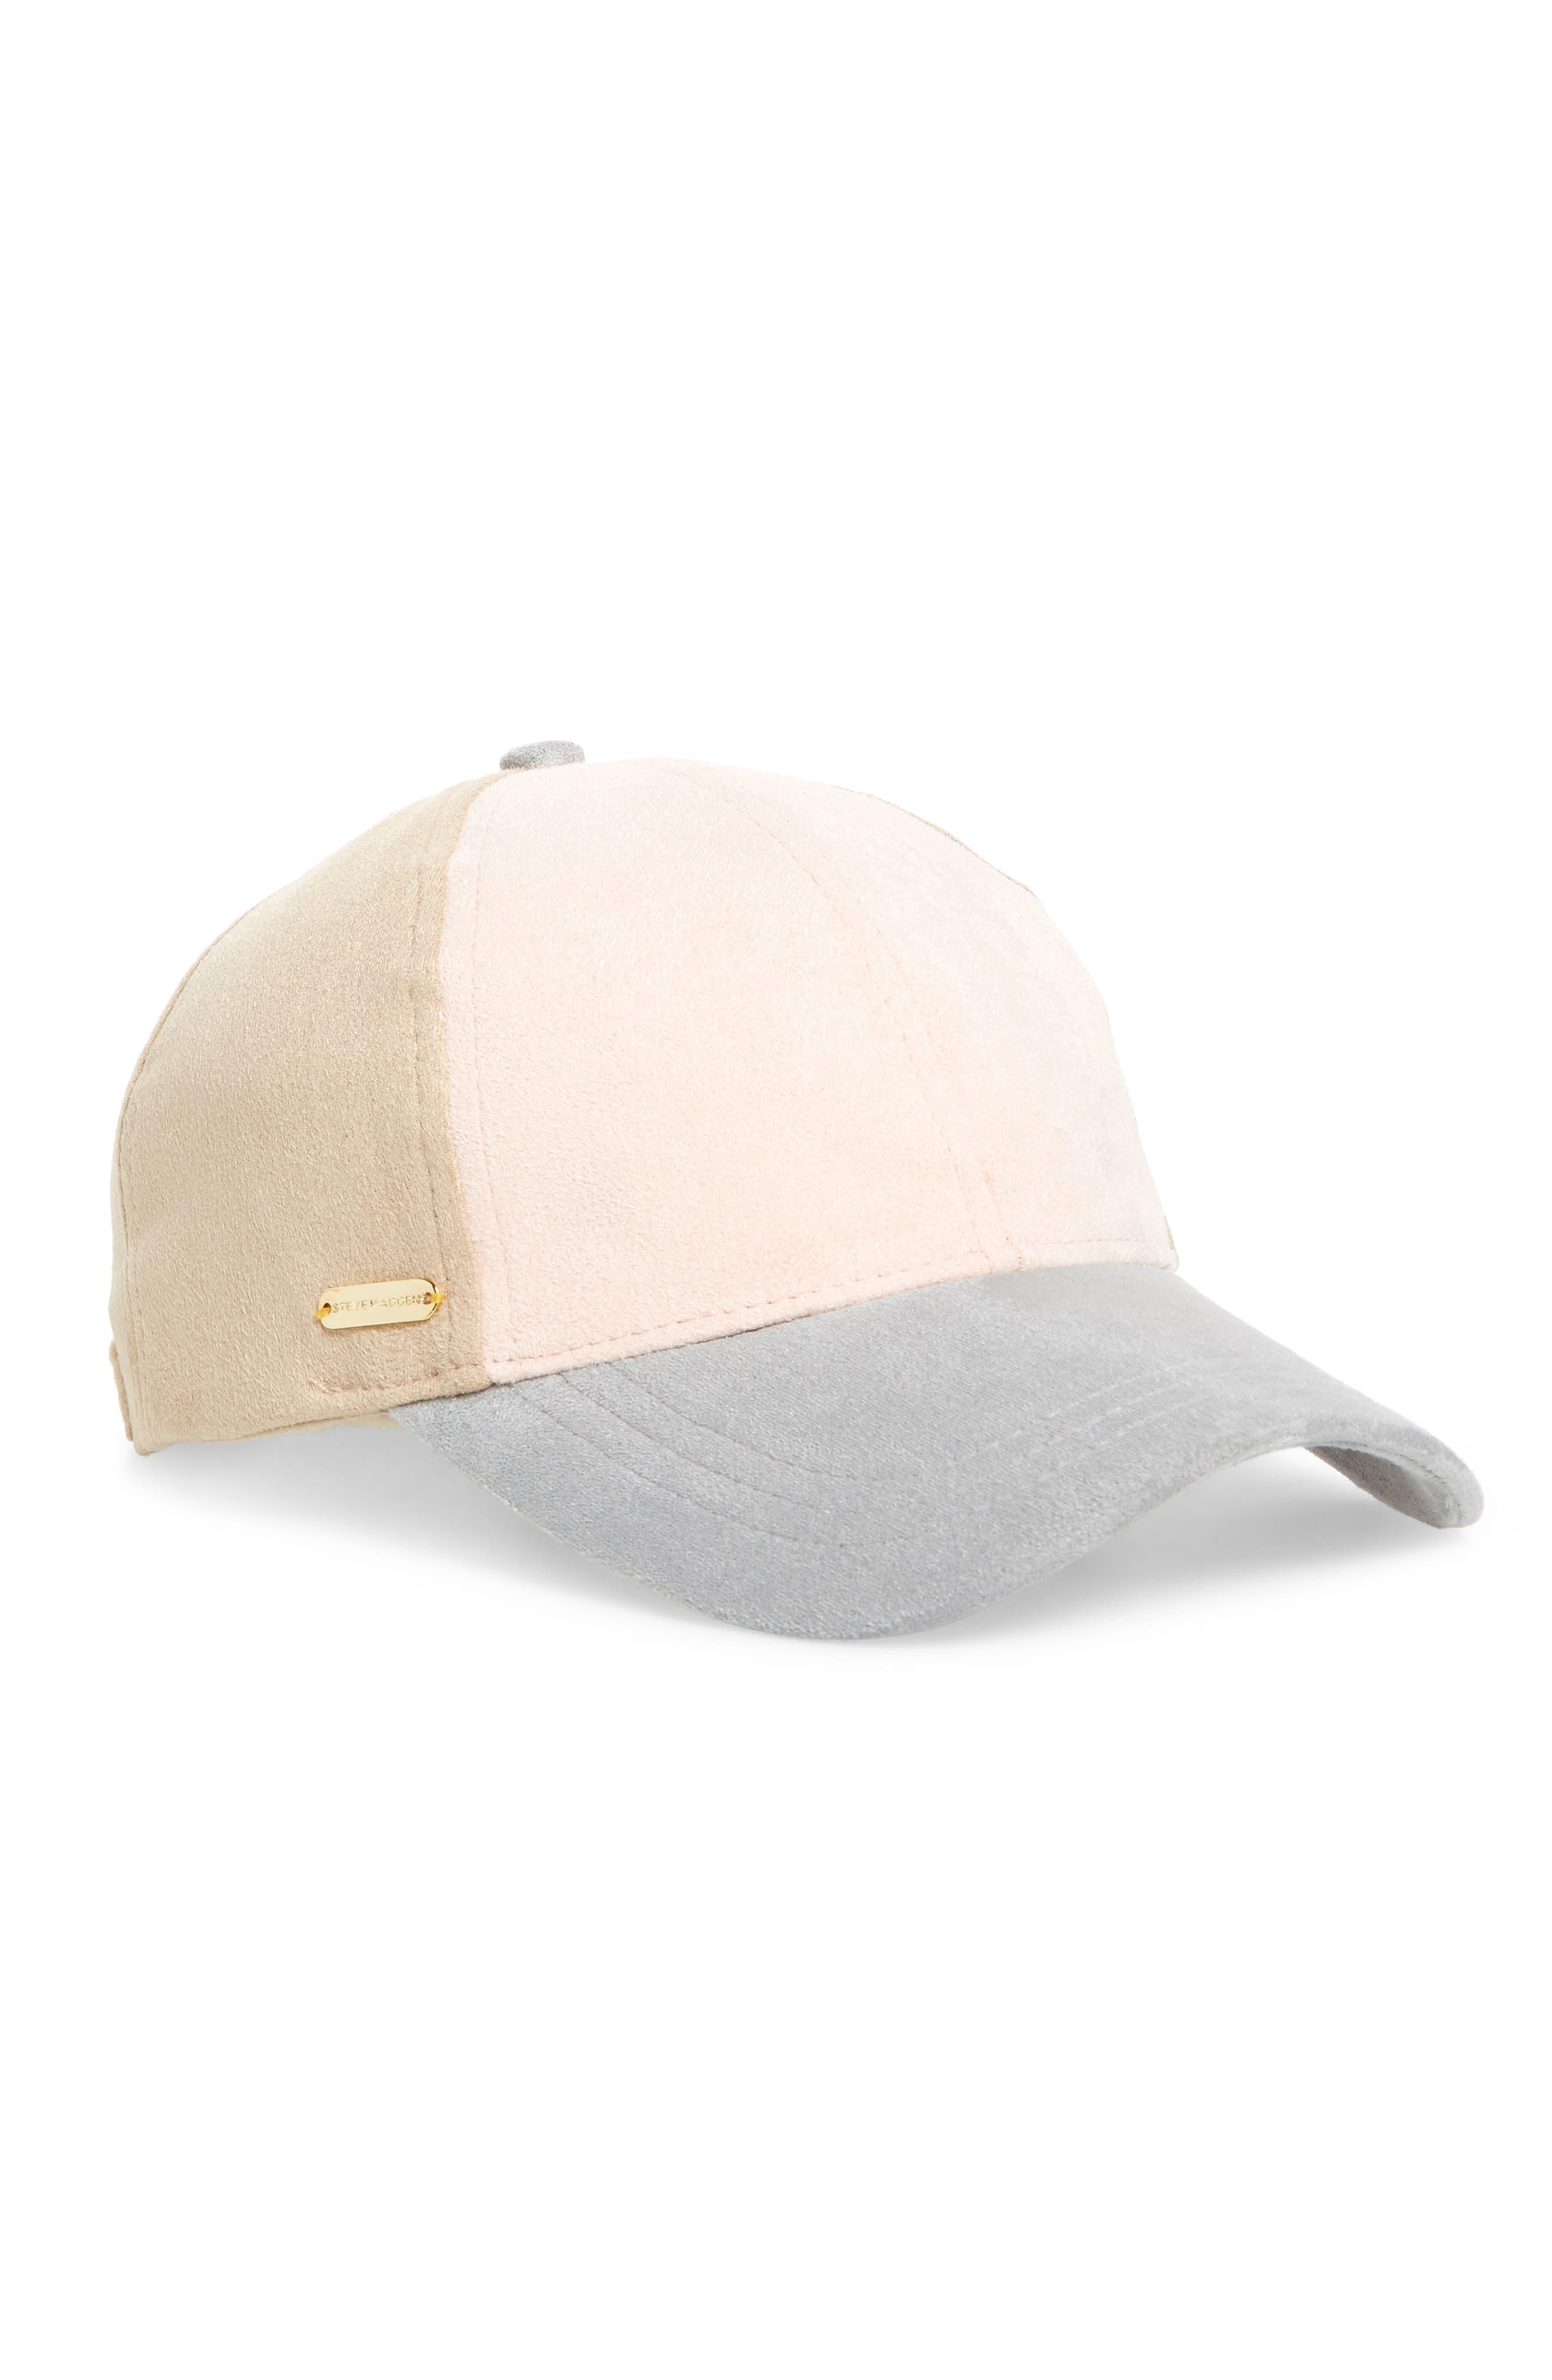 Steve Madden Color Block Baseball Cap